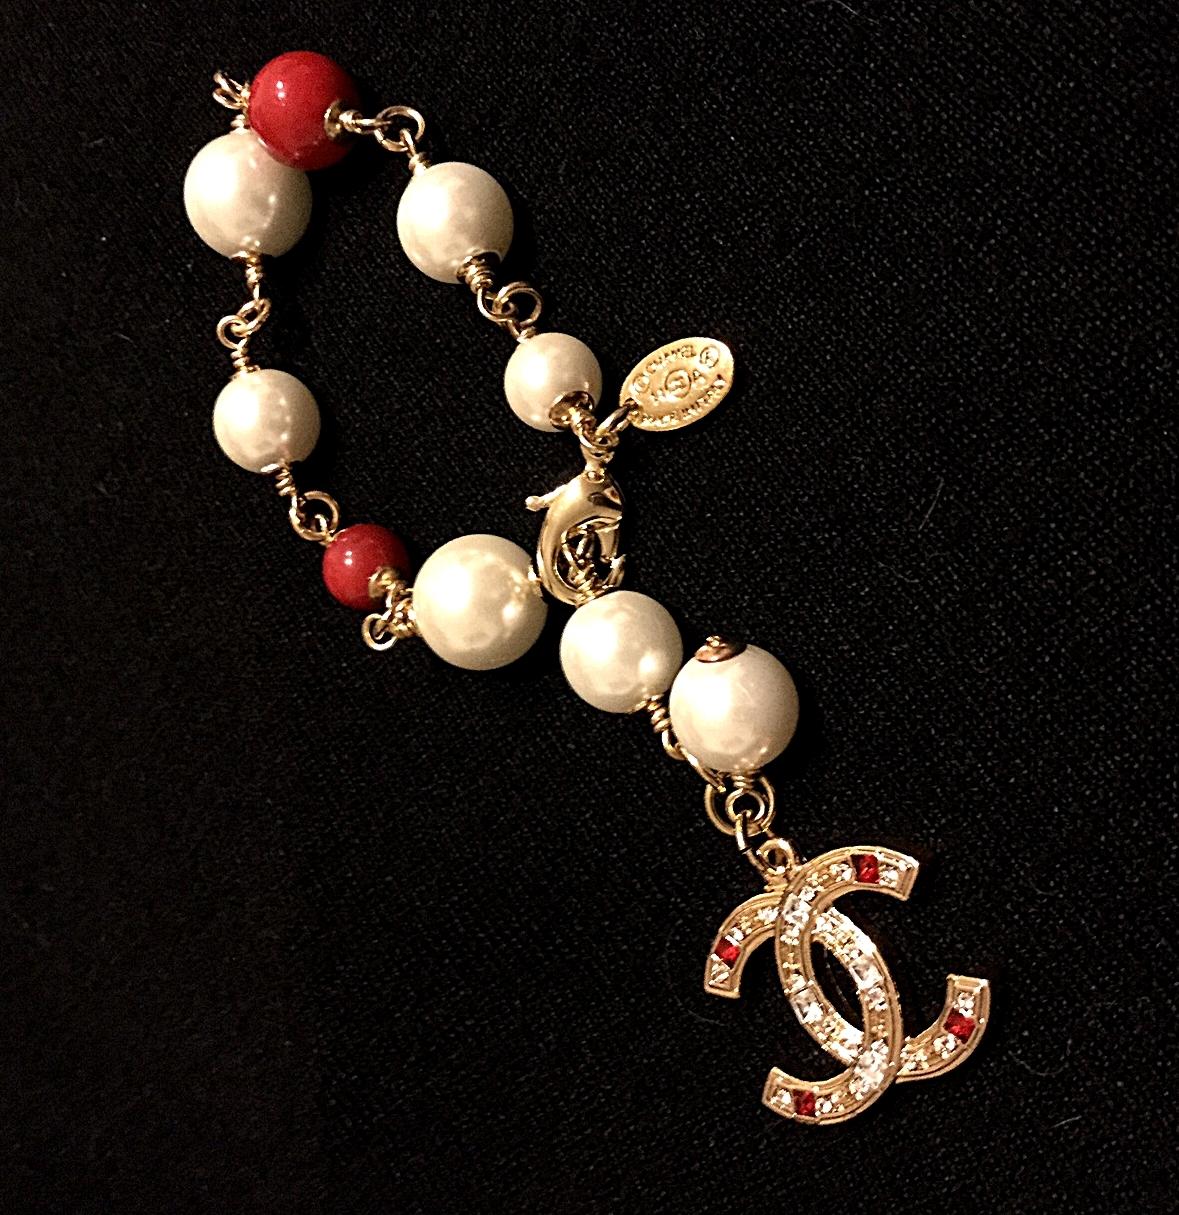 Hallmark Charms For Bracelets: CHANEL Pearl Bracelet Red Crystal CC Logo Costume Jewelry